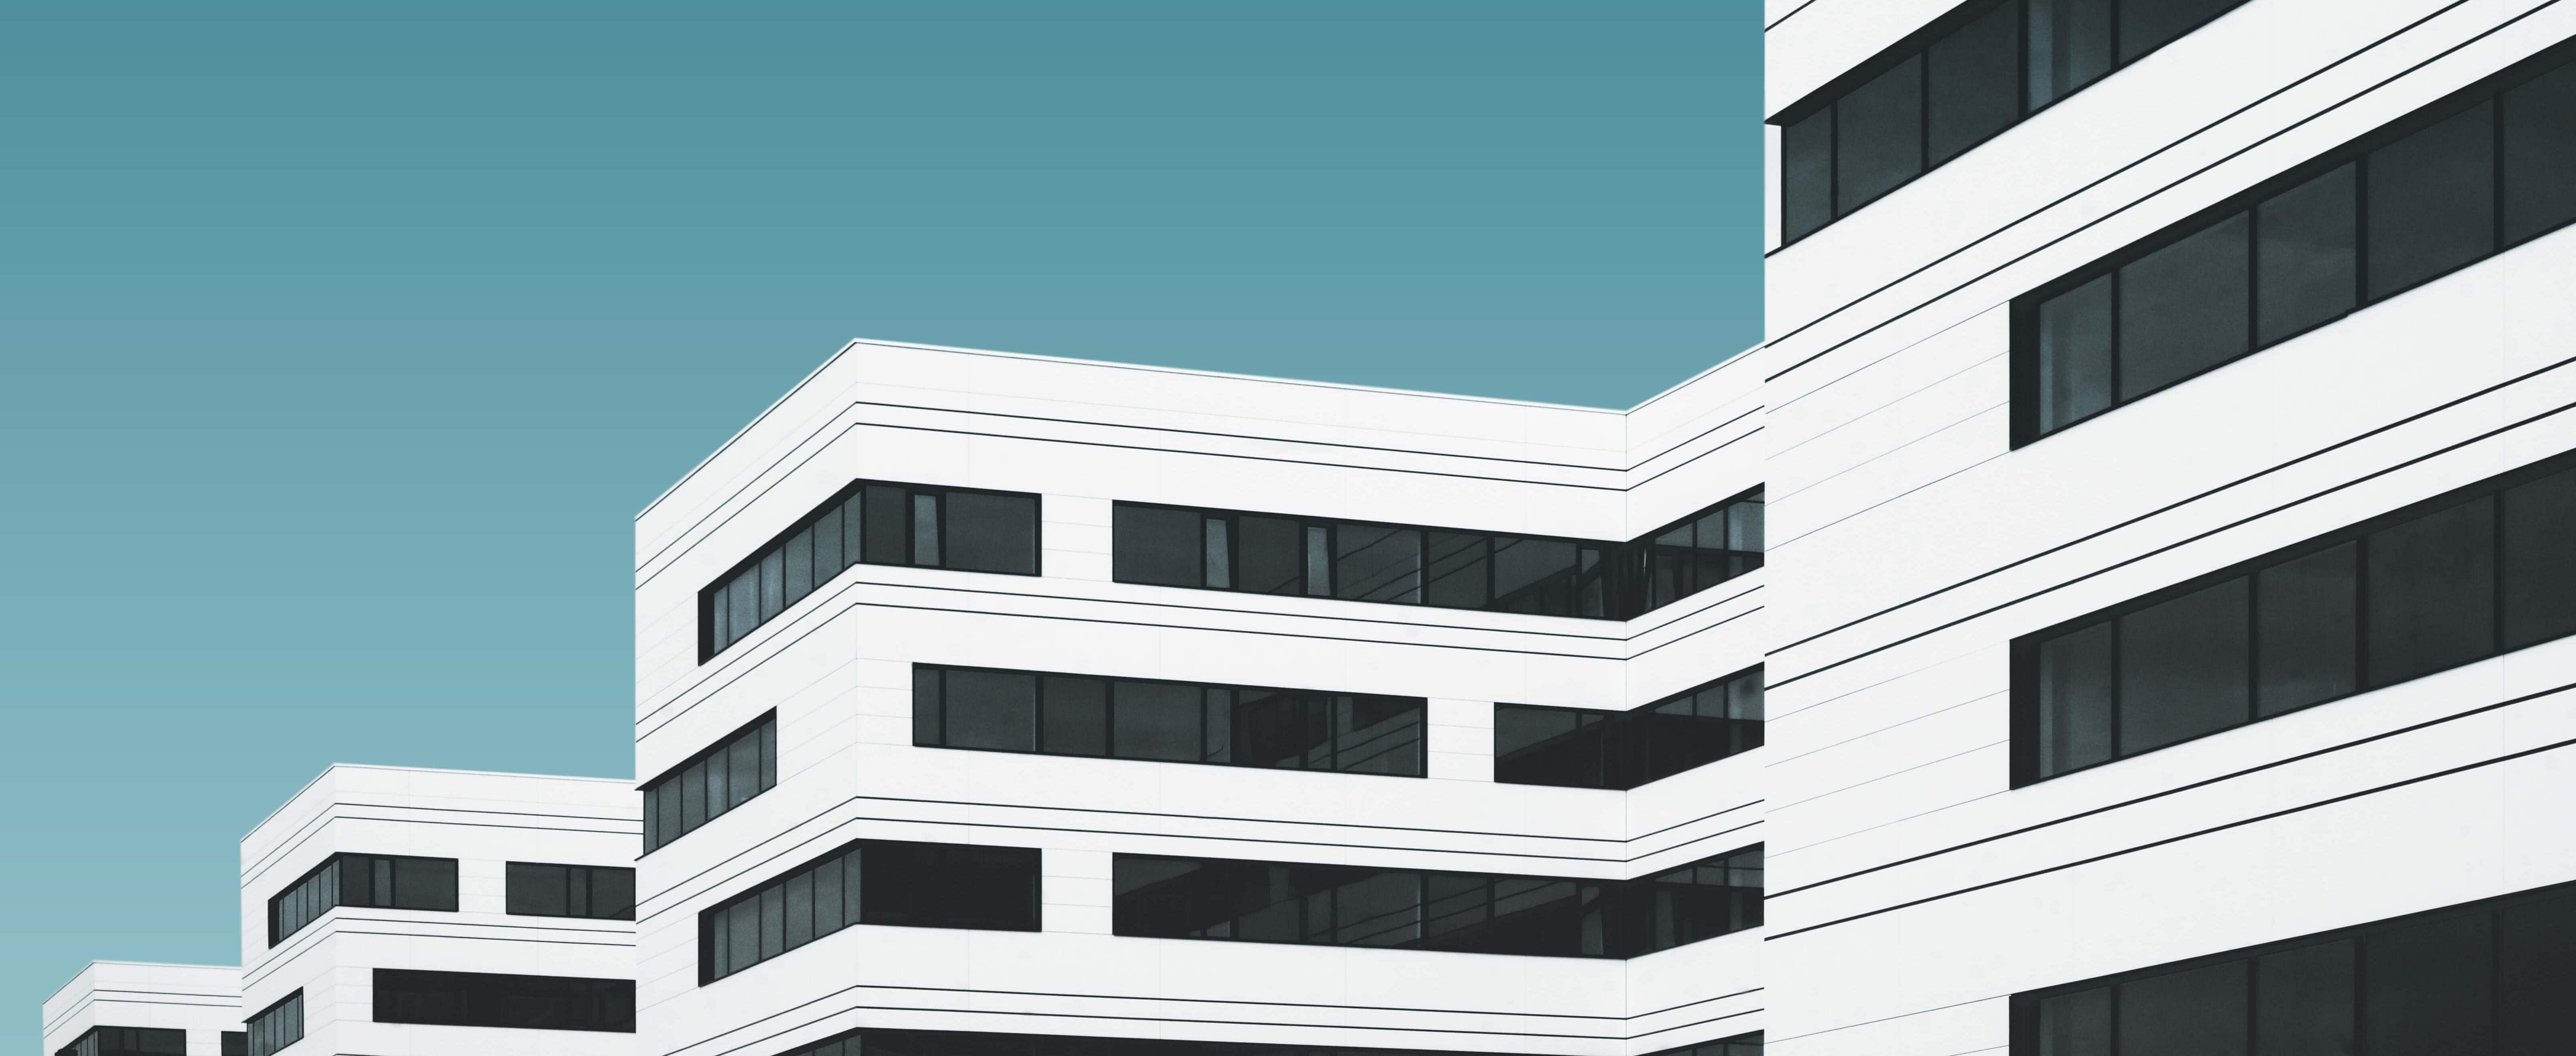 Hospital design patients